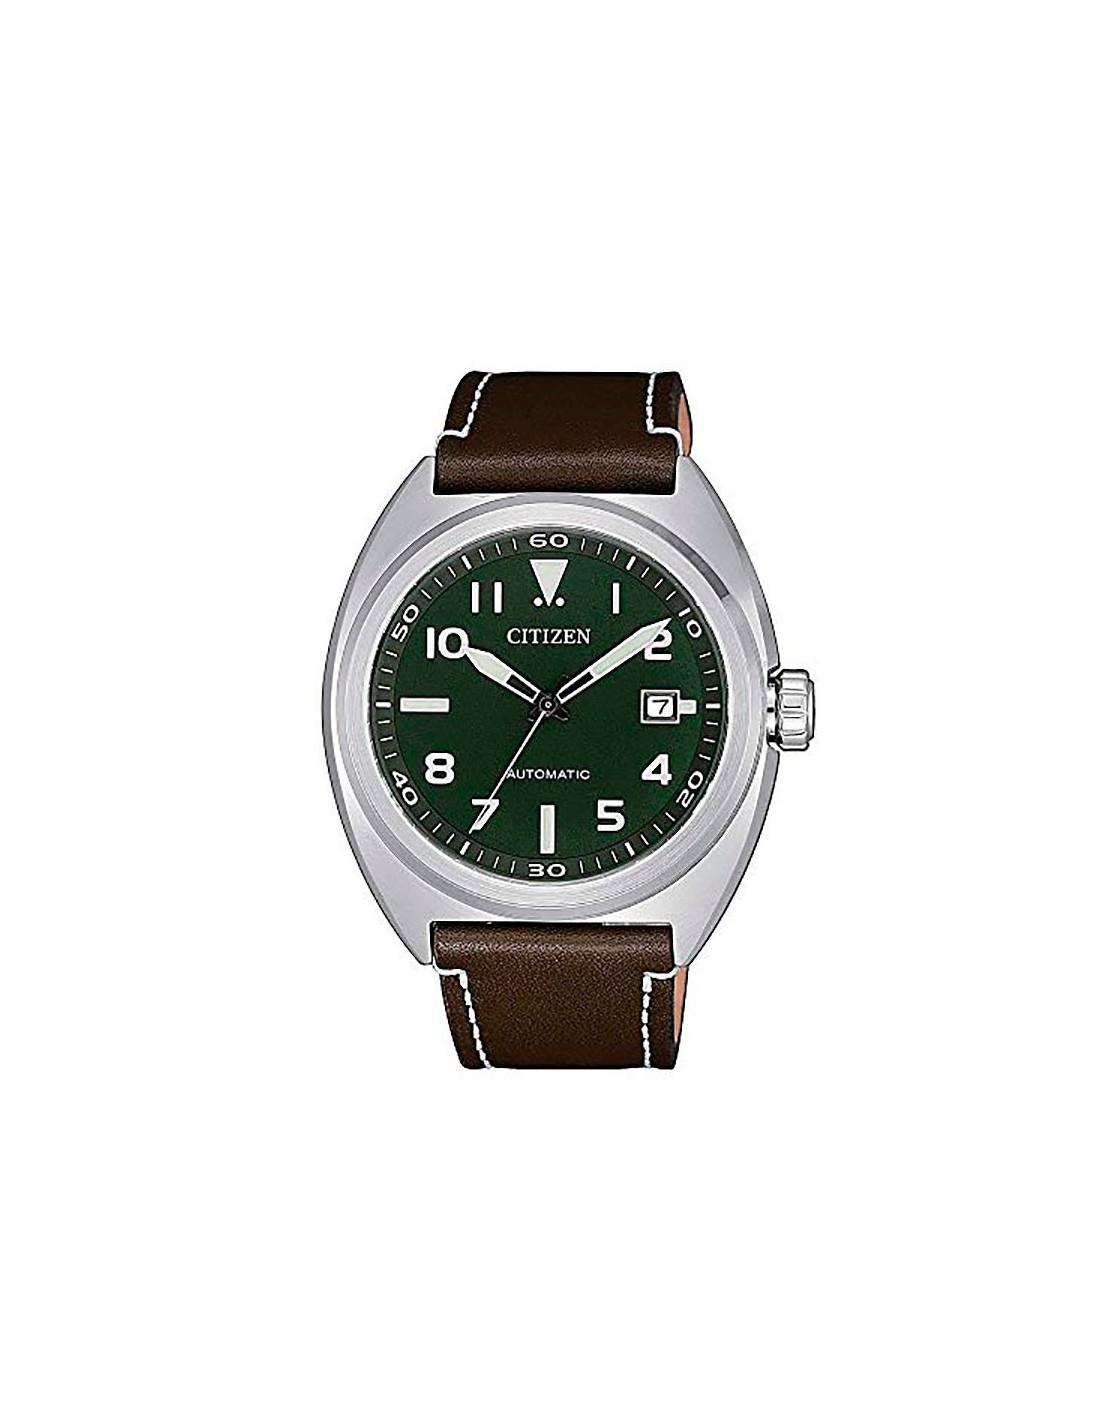 Nj0100 38x Citizen Automatic Watch Nj0100 38x